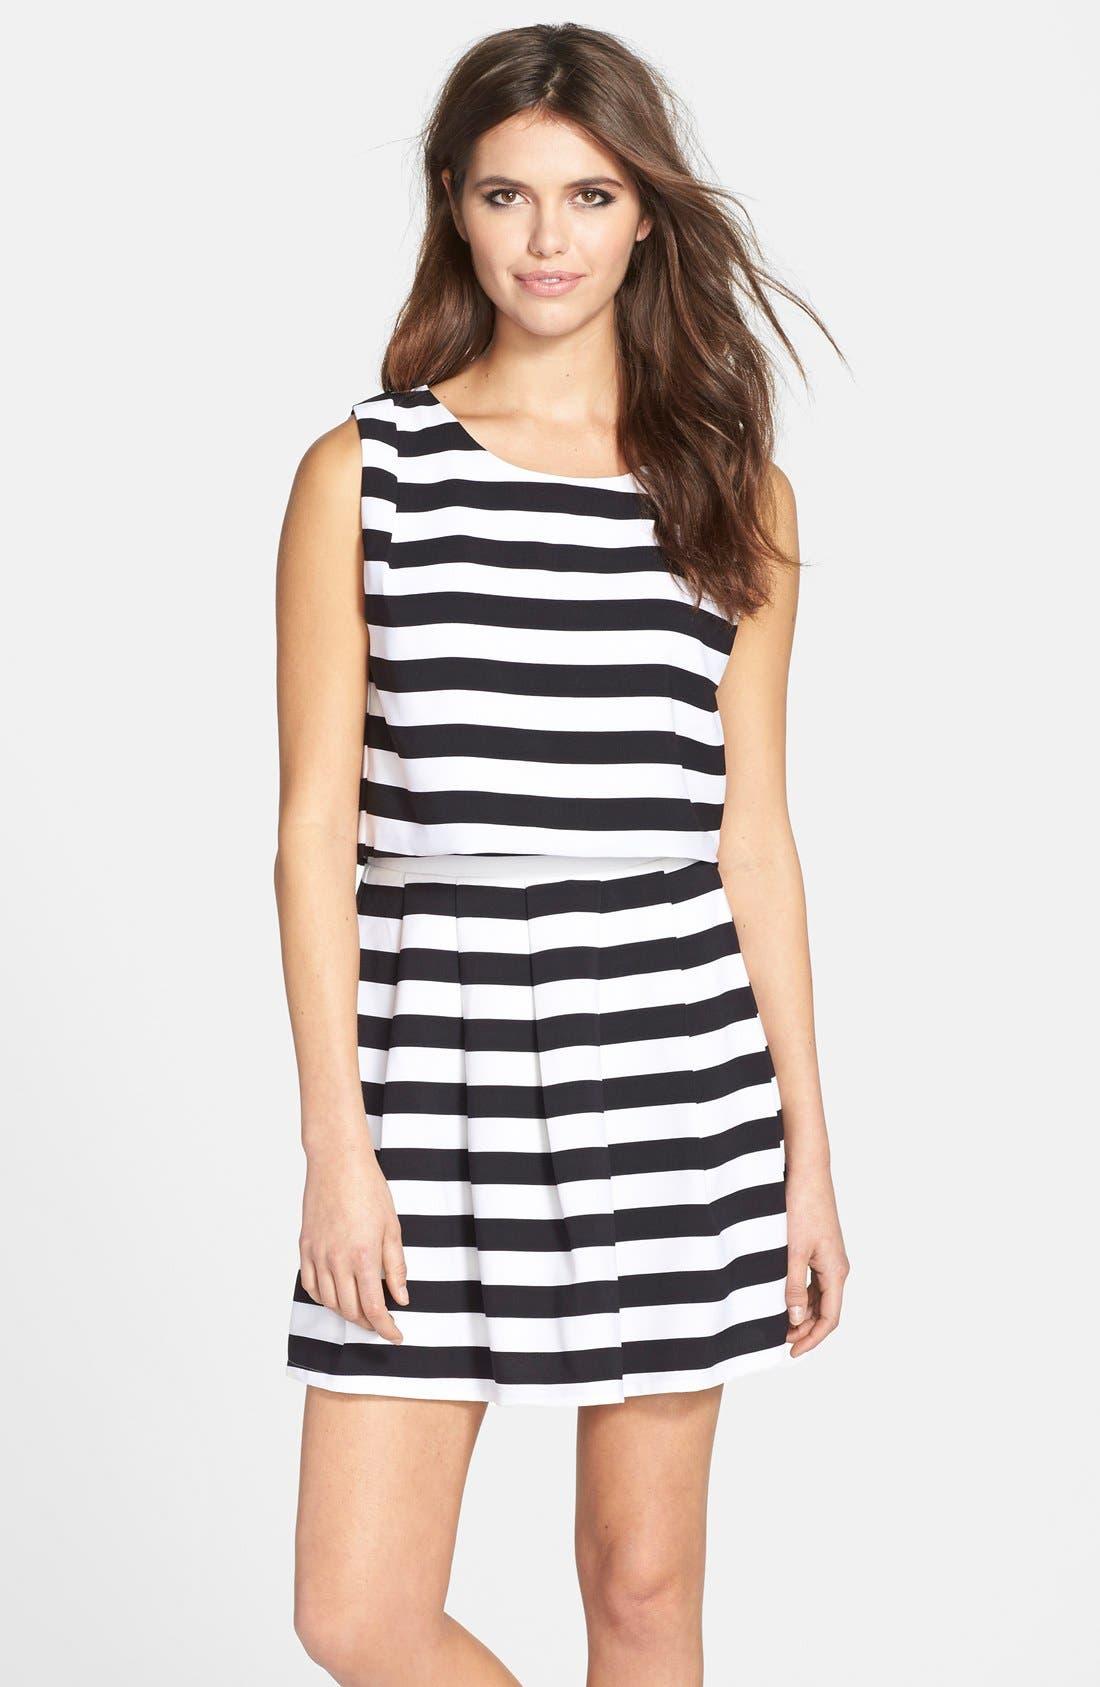 ELLIATT 'Eclipse Stripe' Crepe Crop Top & Skirt, Main, color, 003